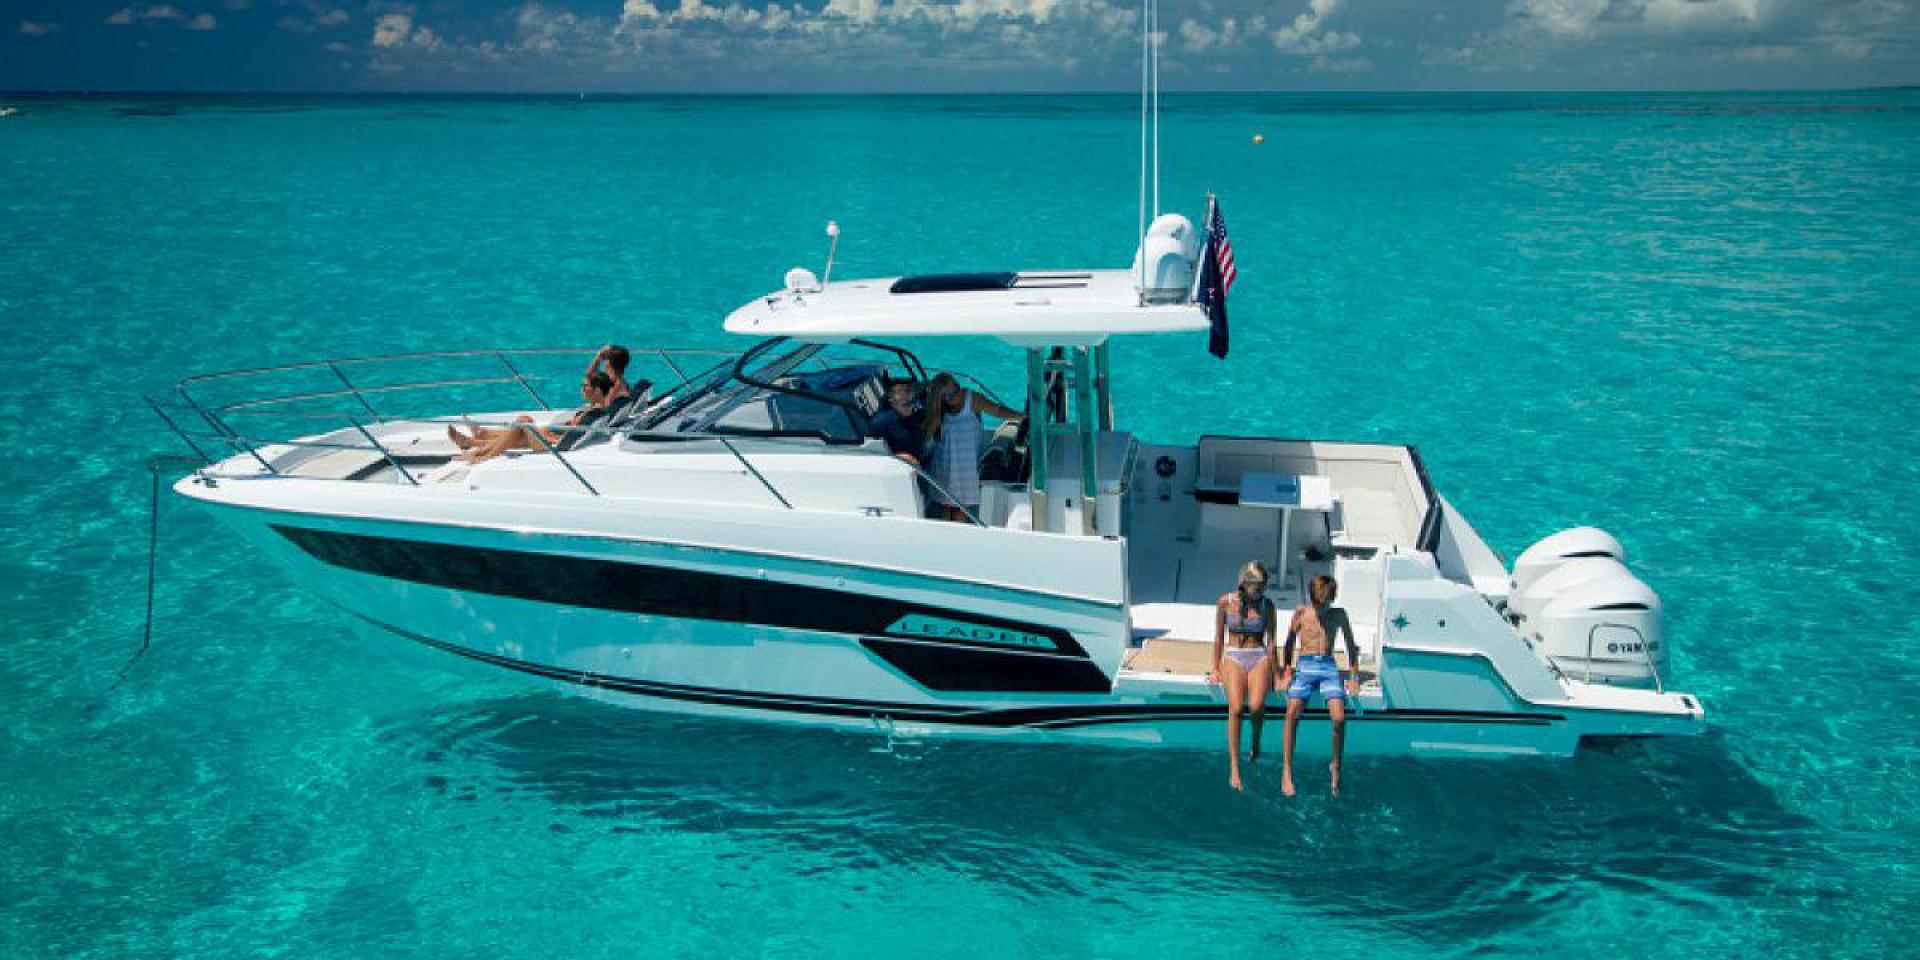 Jeanneau Leader: Built for Summer Cruising Fun